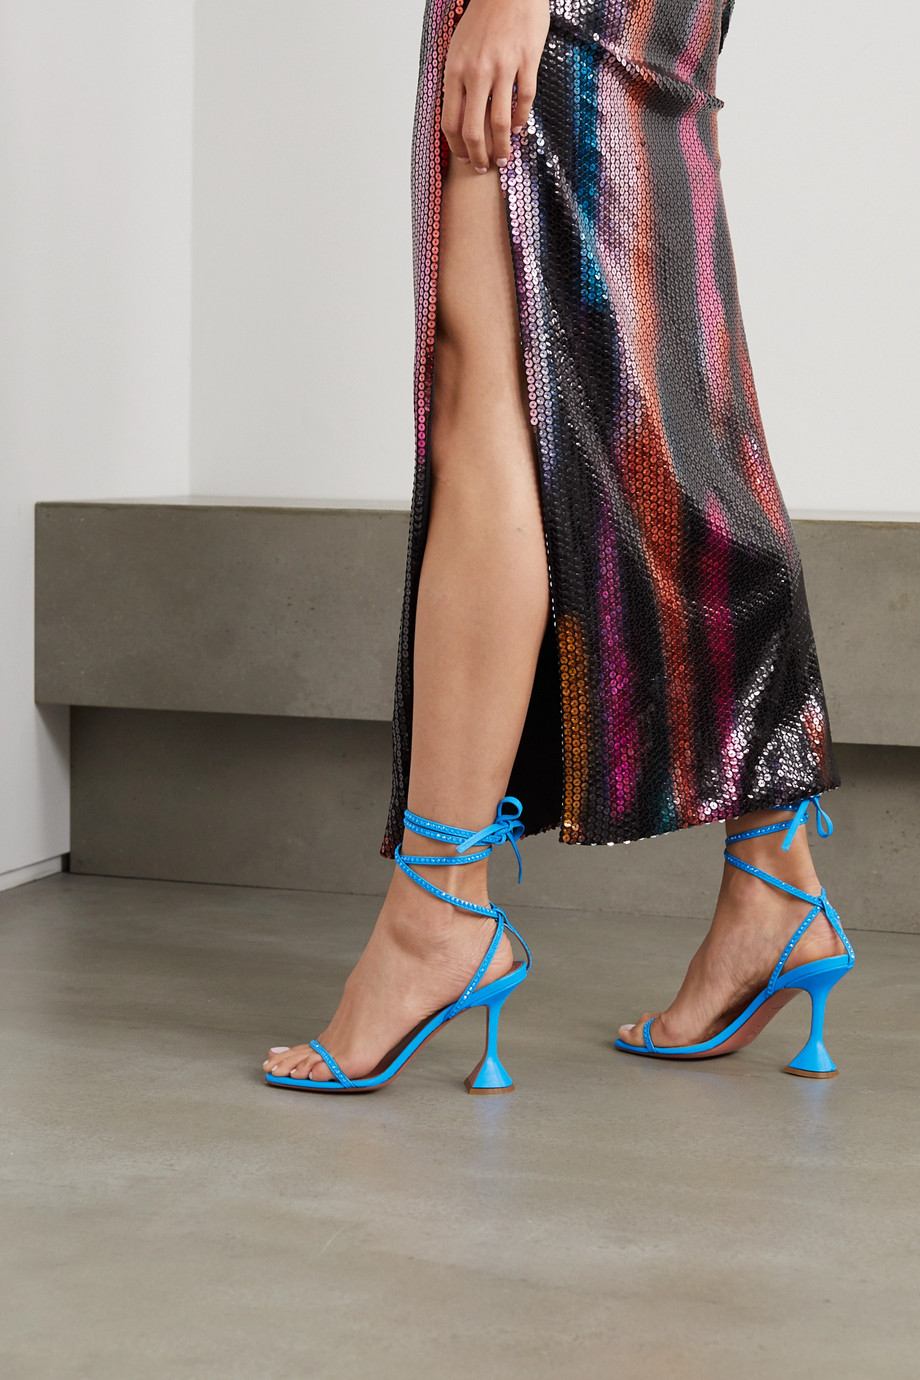 Amina Muaddi Vita Sandalen aus Leder mit Kristallen